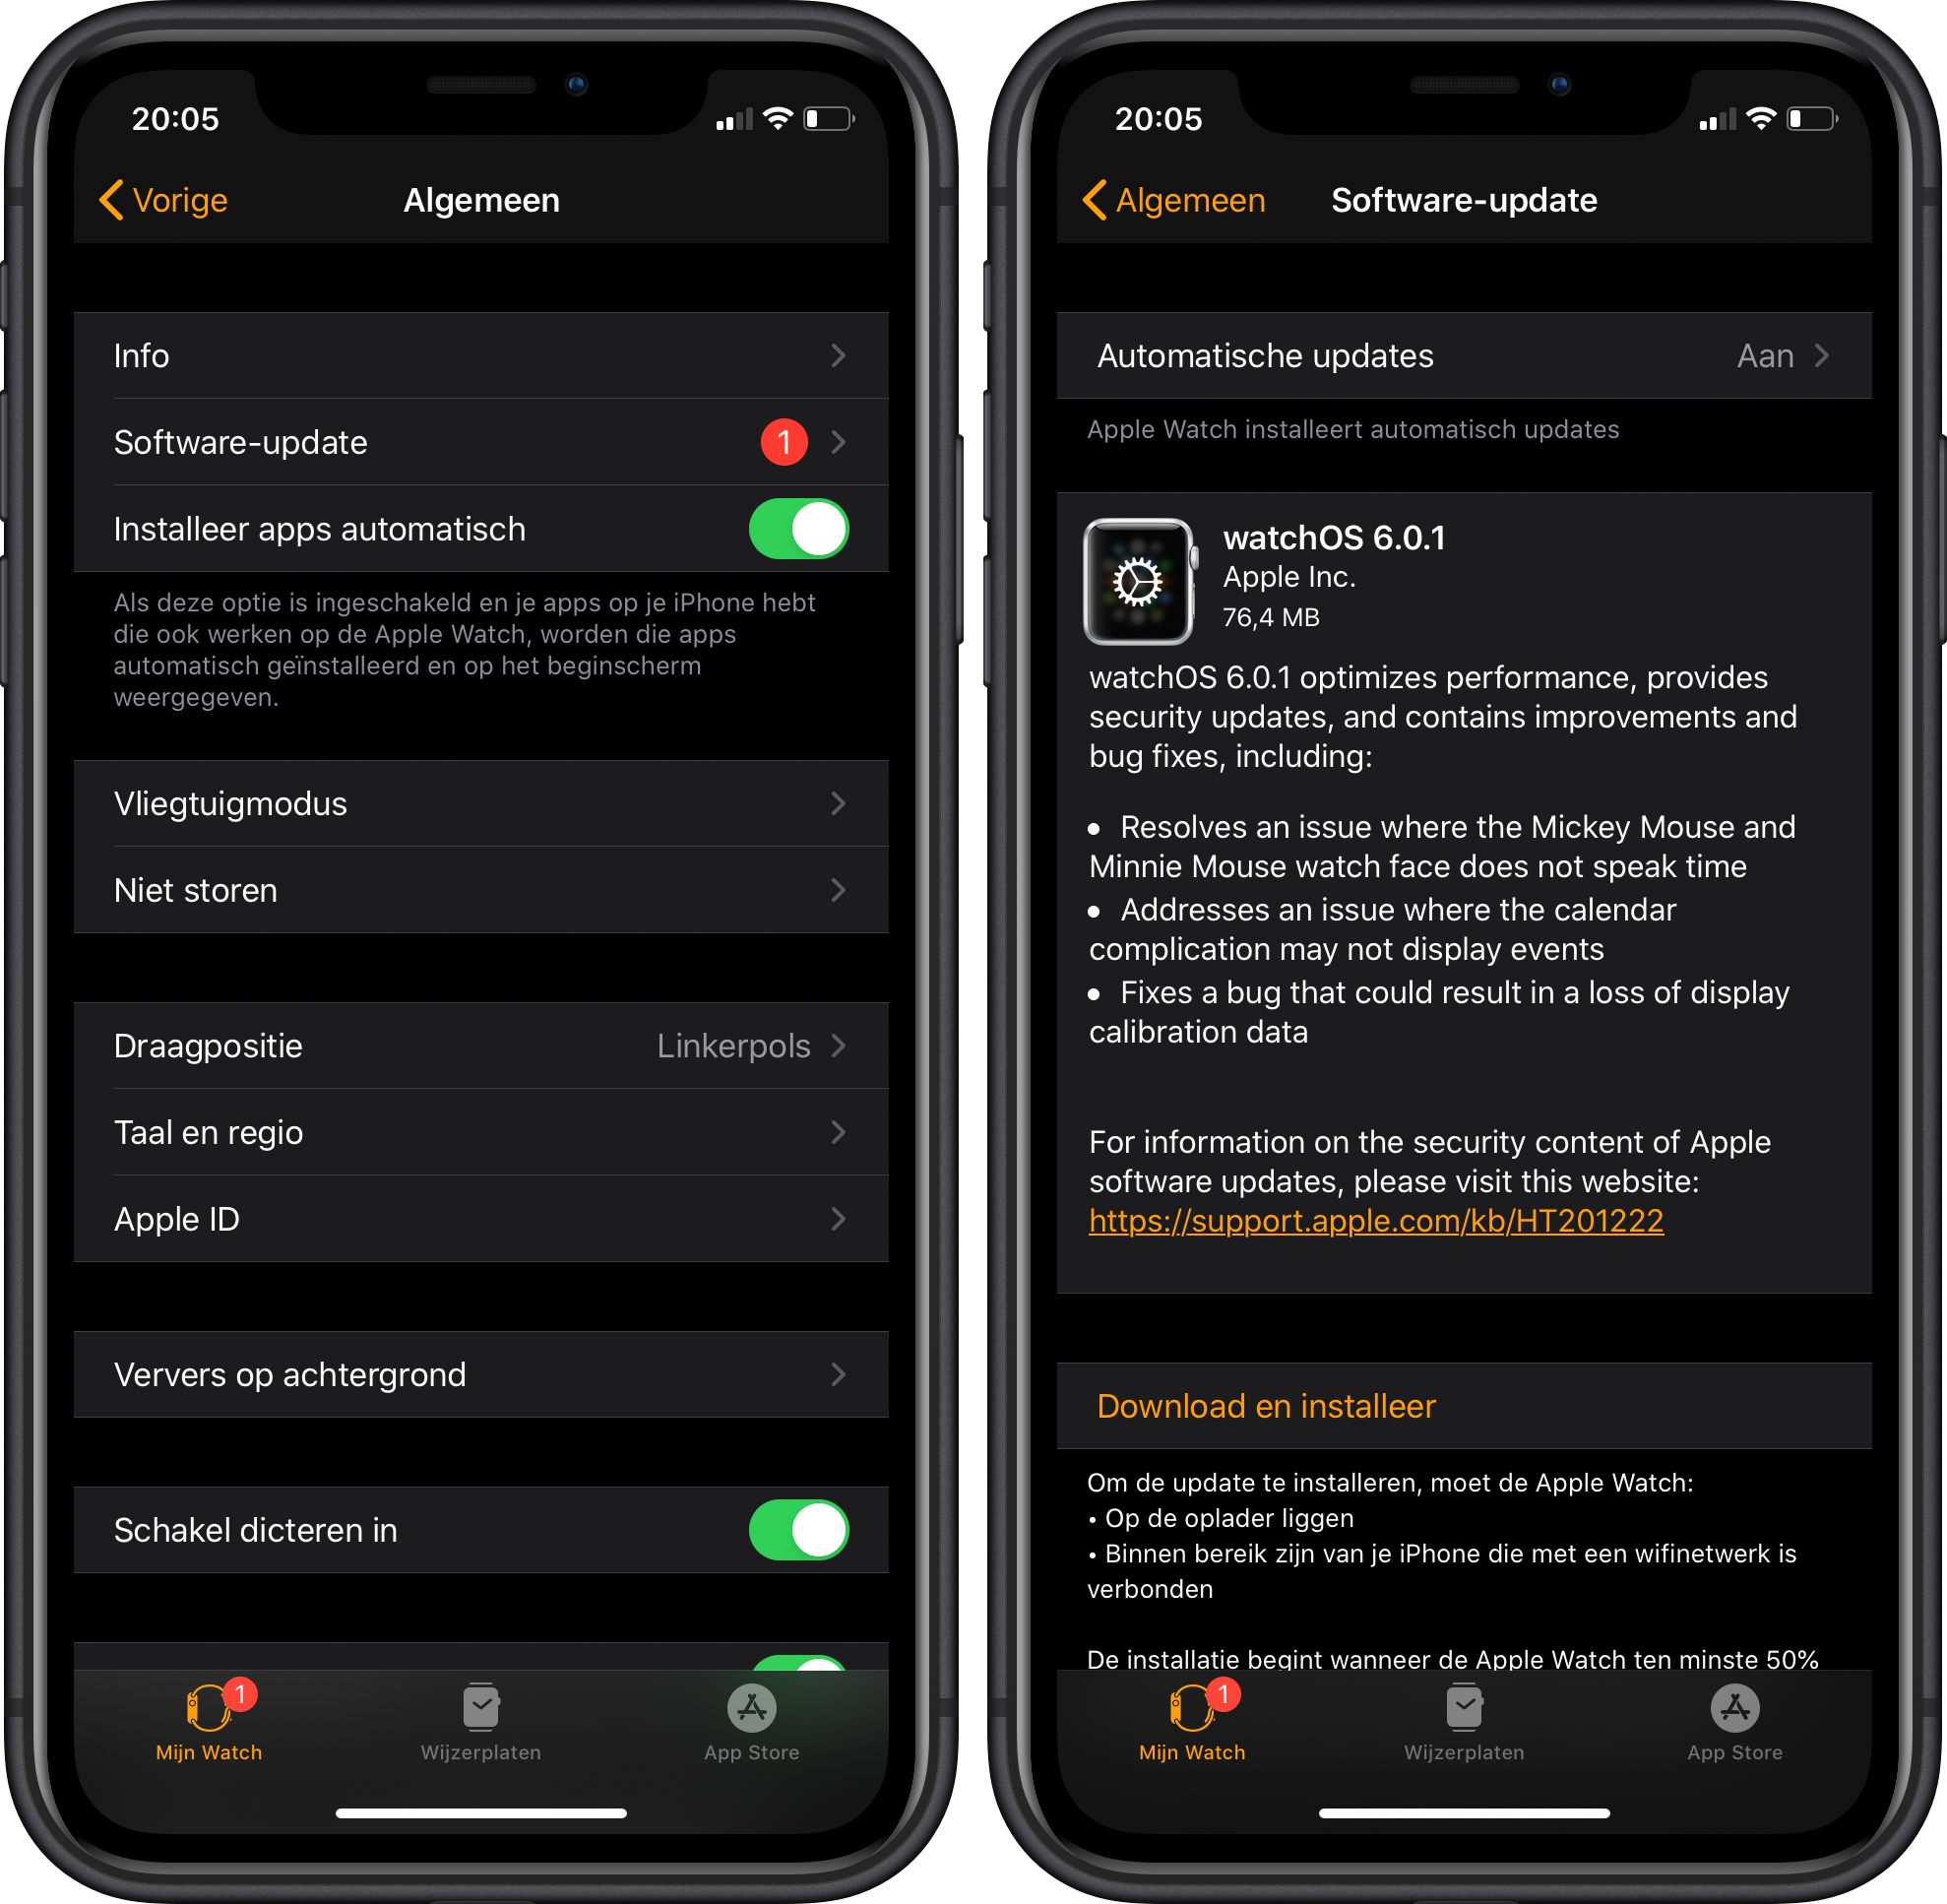 watchOS 6.0.1 Apple Watch 001